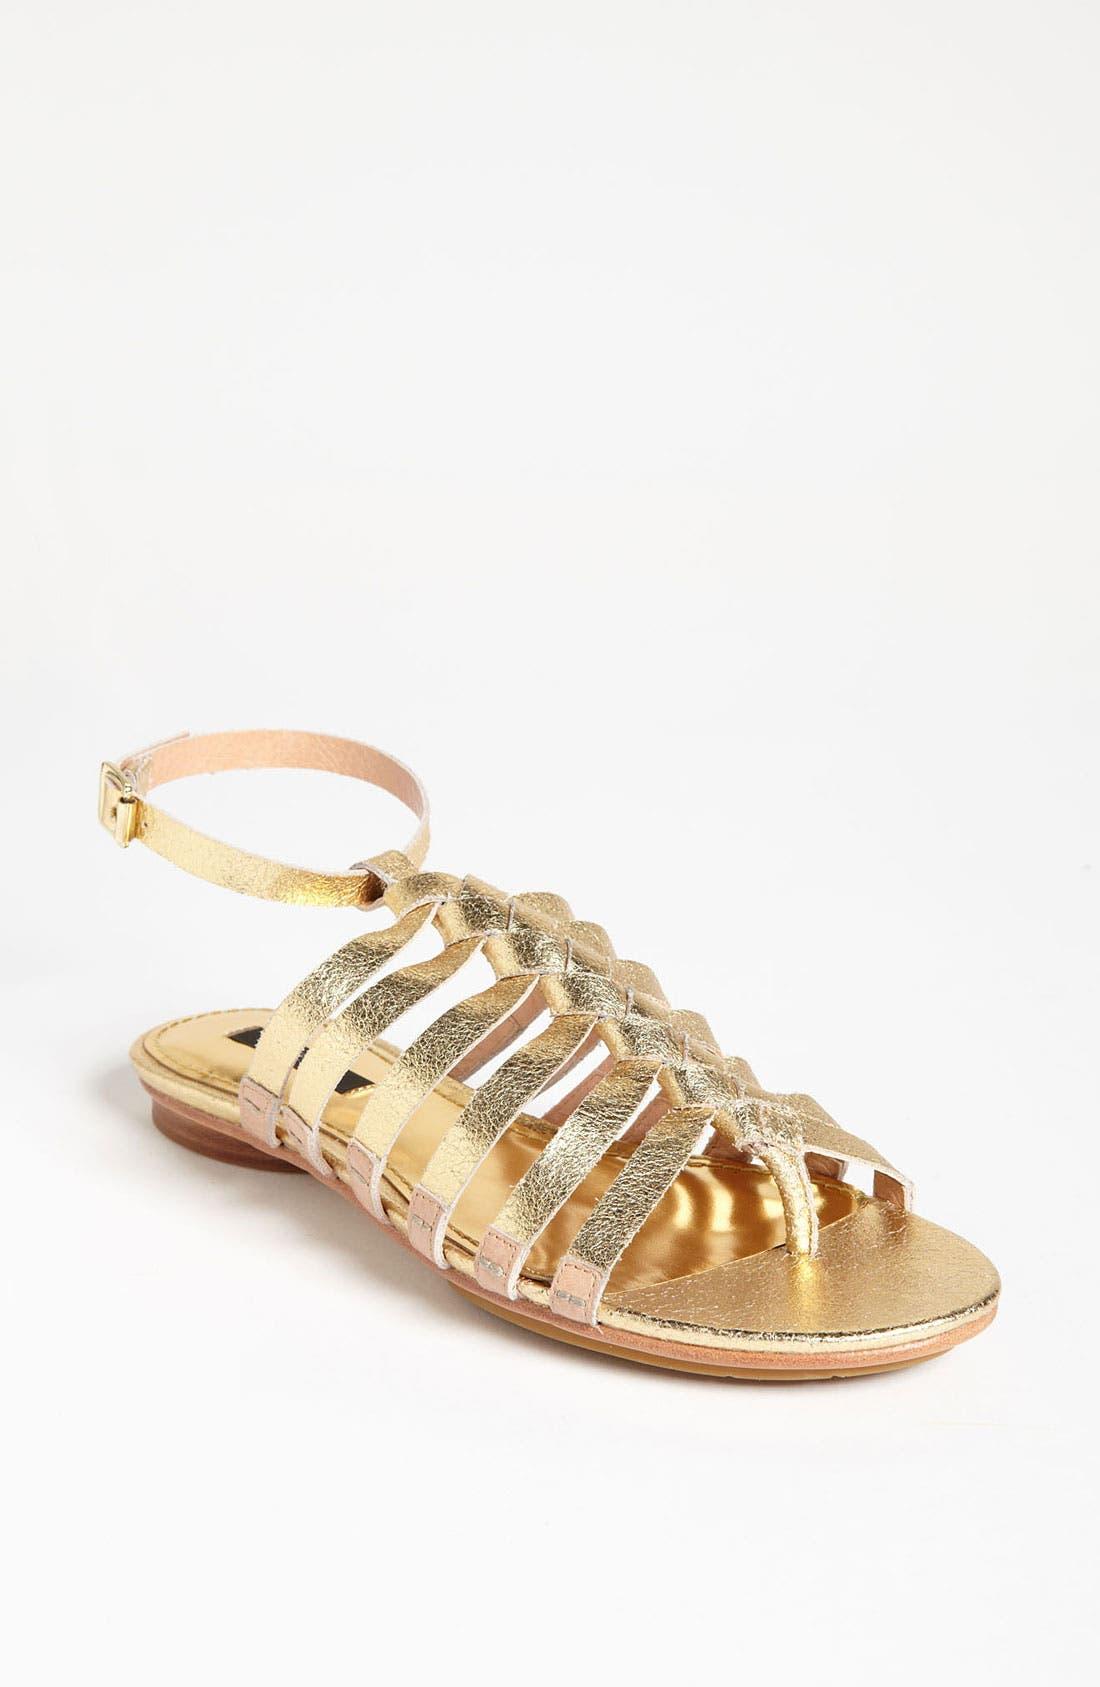 Alternate Image 1 Selected - Rachel Zoe 'Carlyle' Sandal